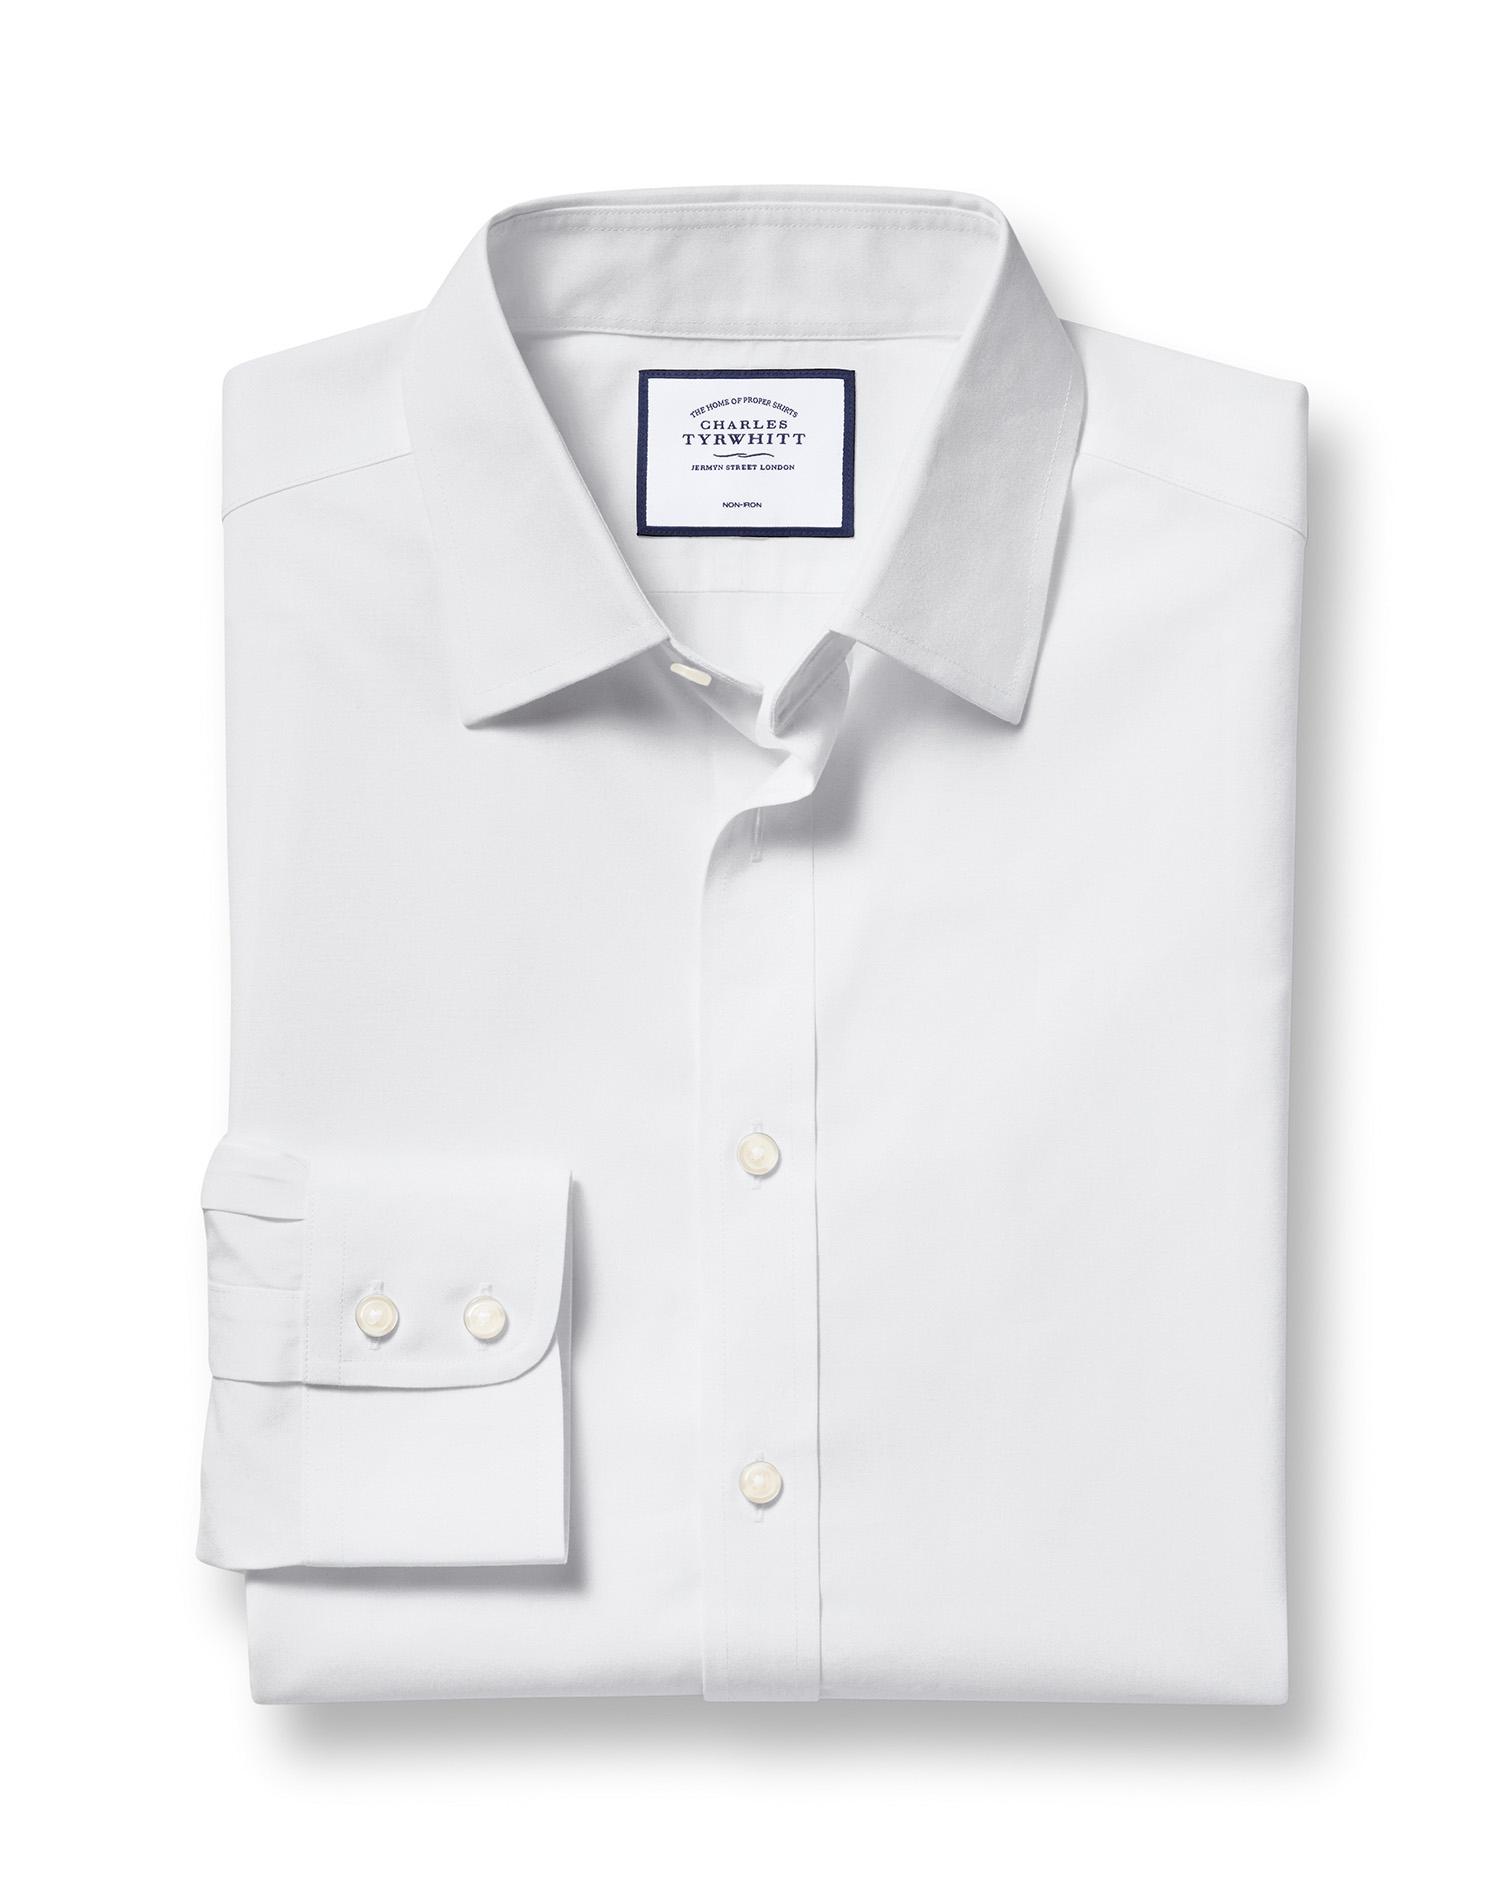 Classic Fit White Non-Iron Poplin Cotton Formal Shirt Single Cuff Size 18/36 by Charles Tyrwhitt